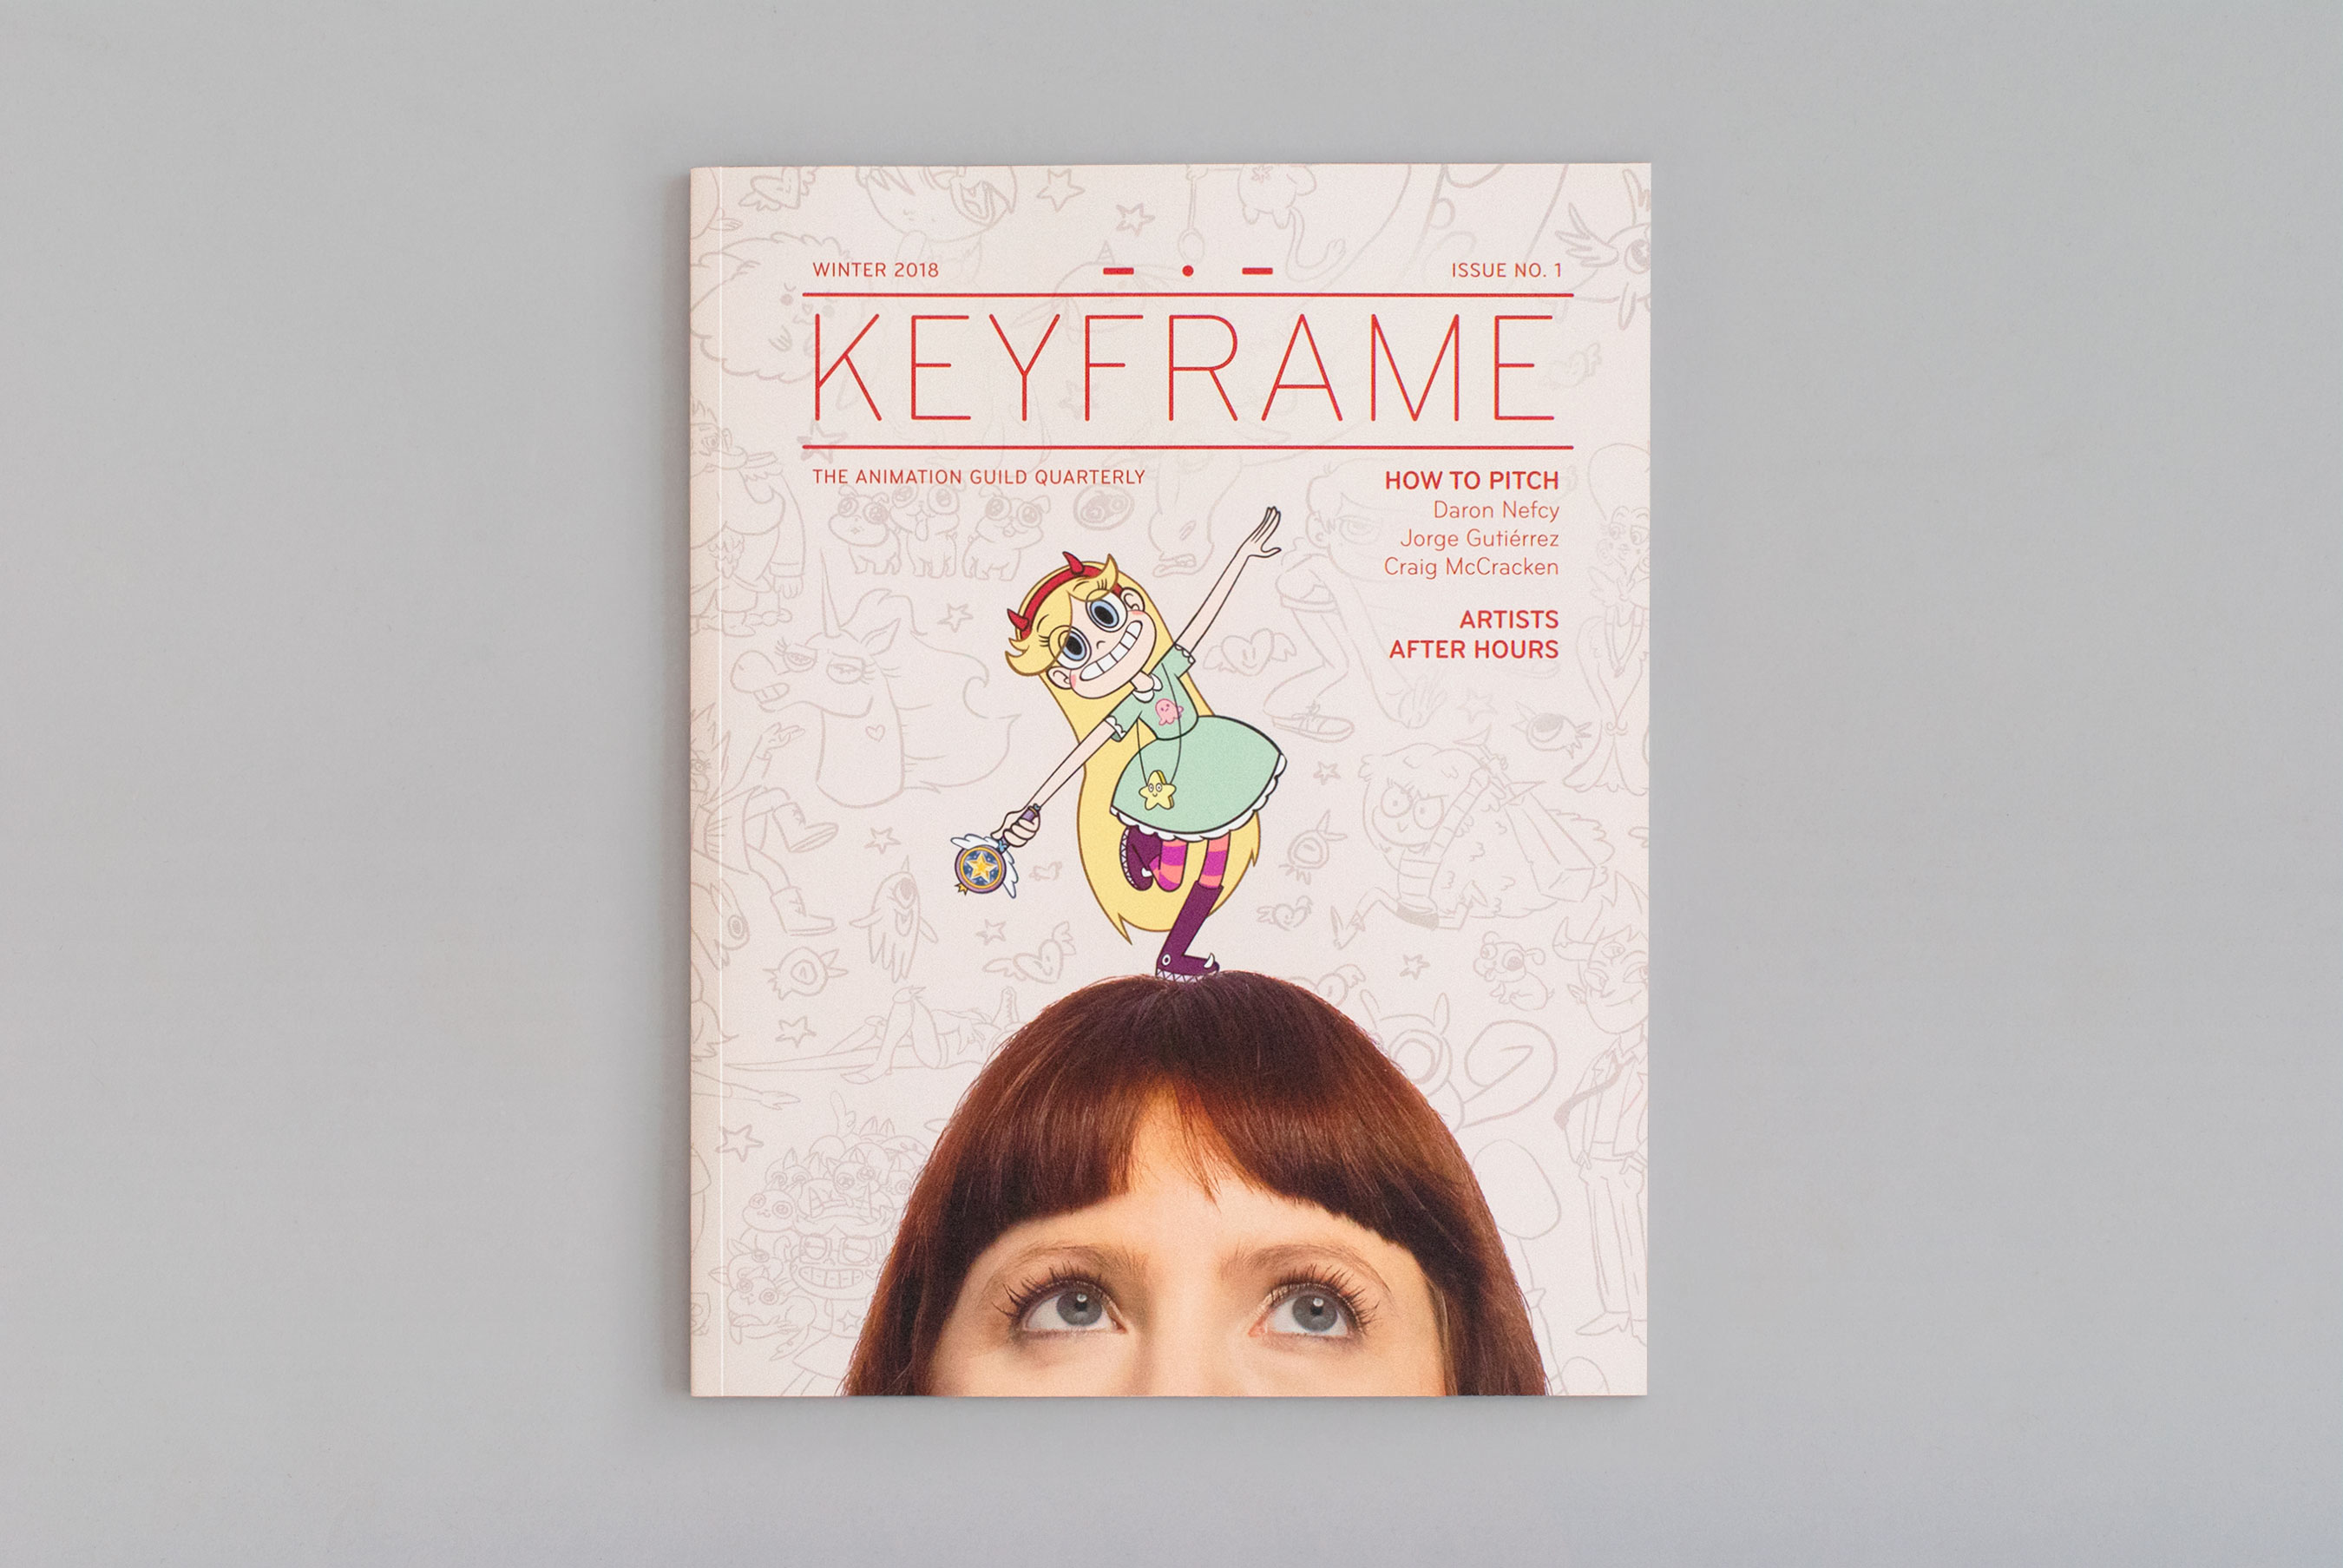 Keyframe cover